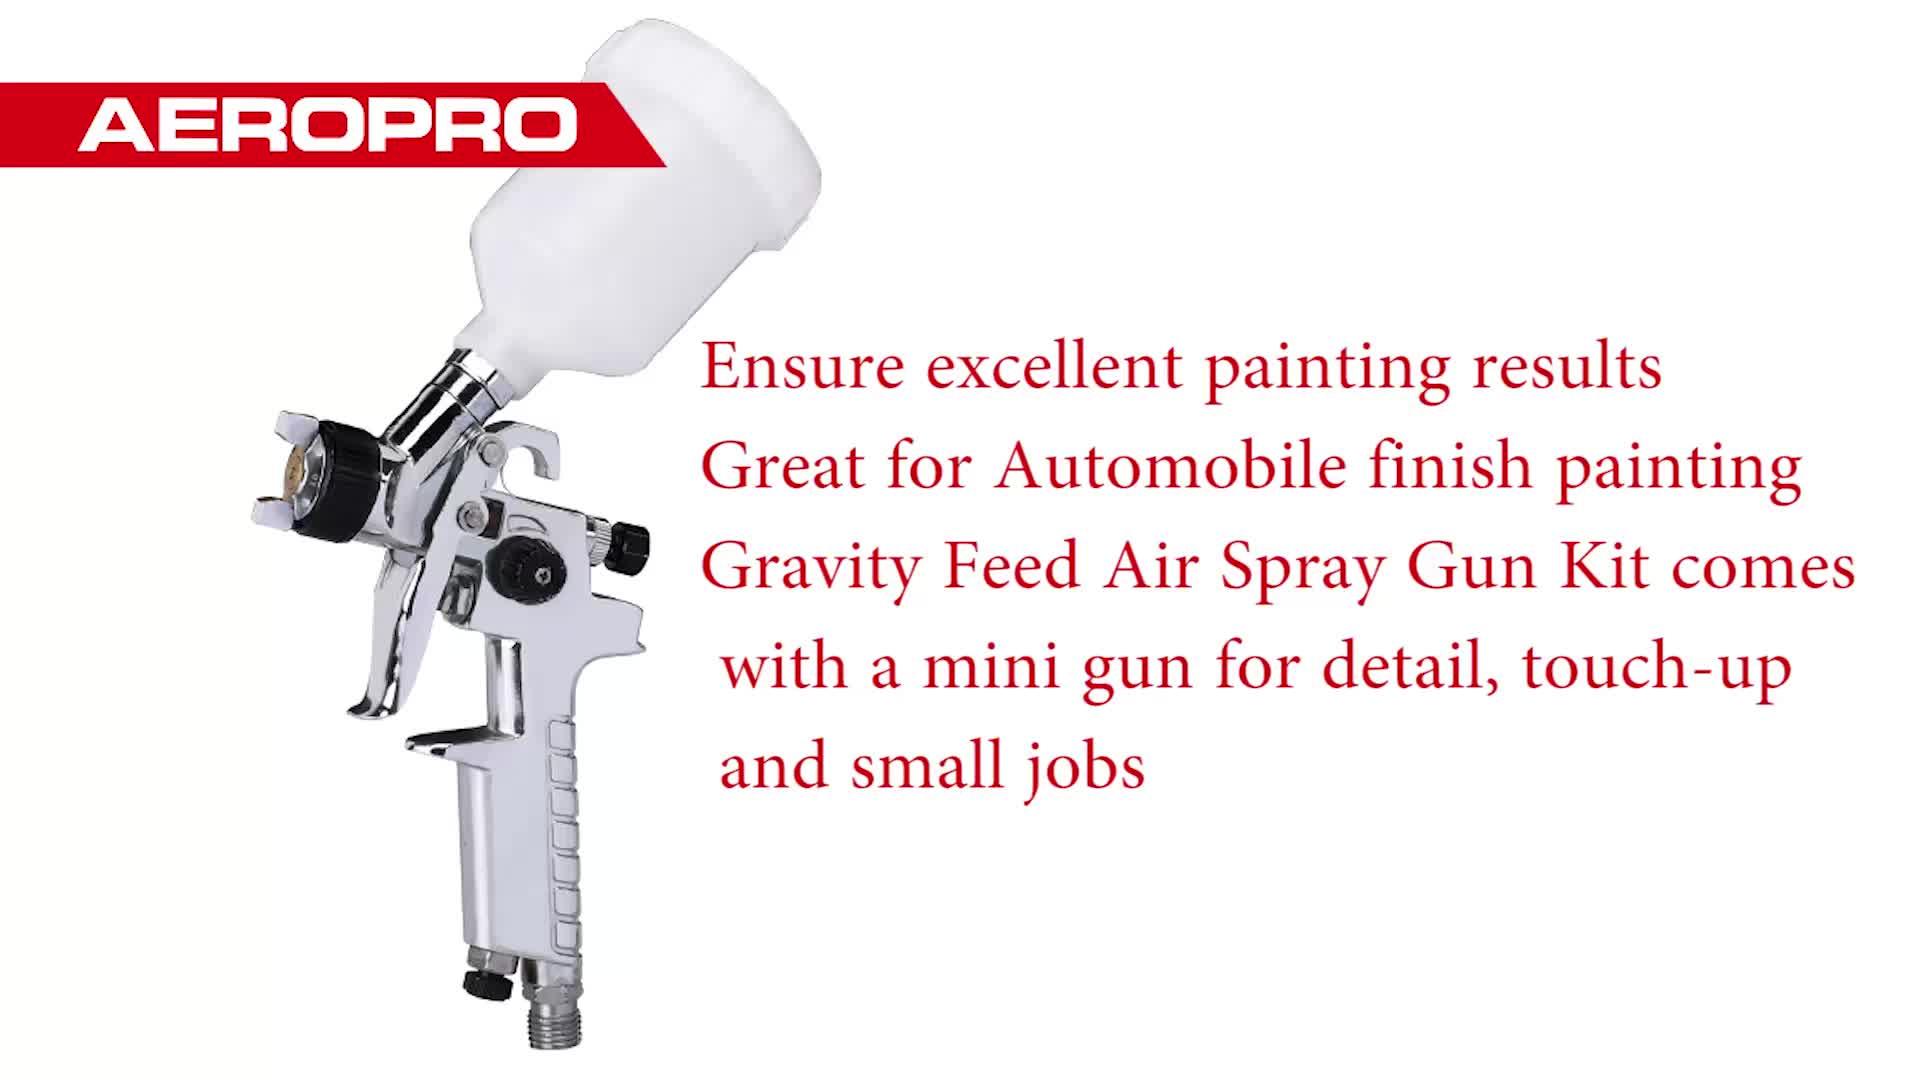 AEROPRO A602 Air Touch Up Gtavity пистолет-распылитель